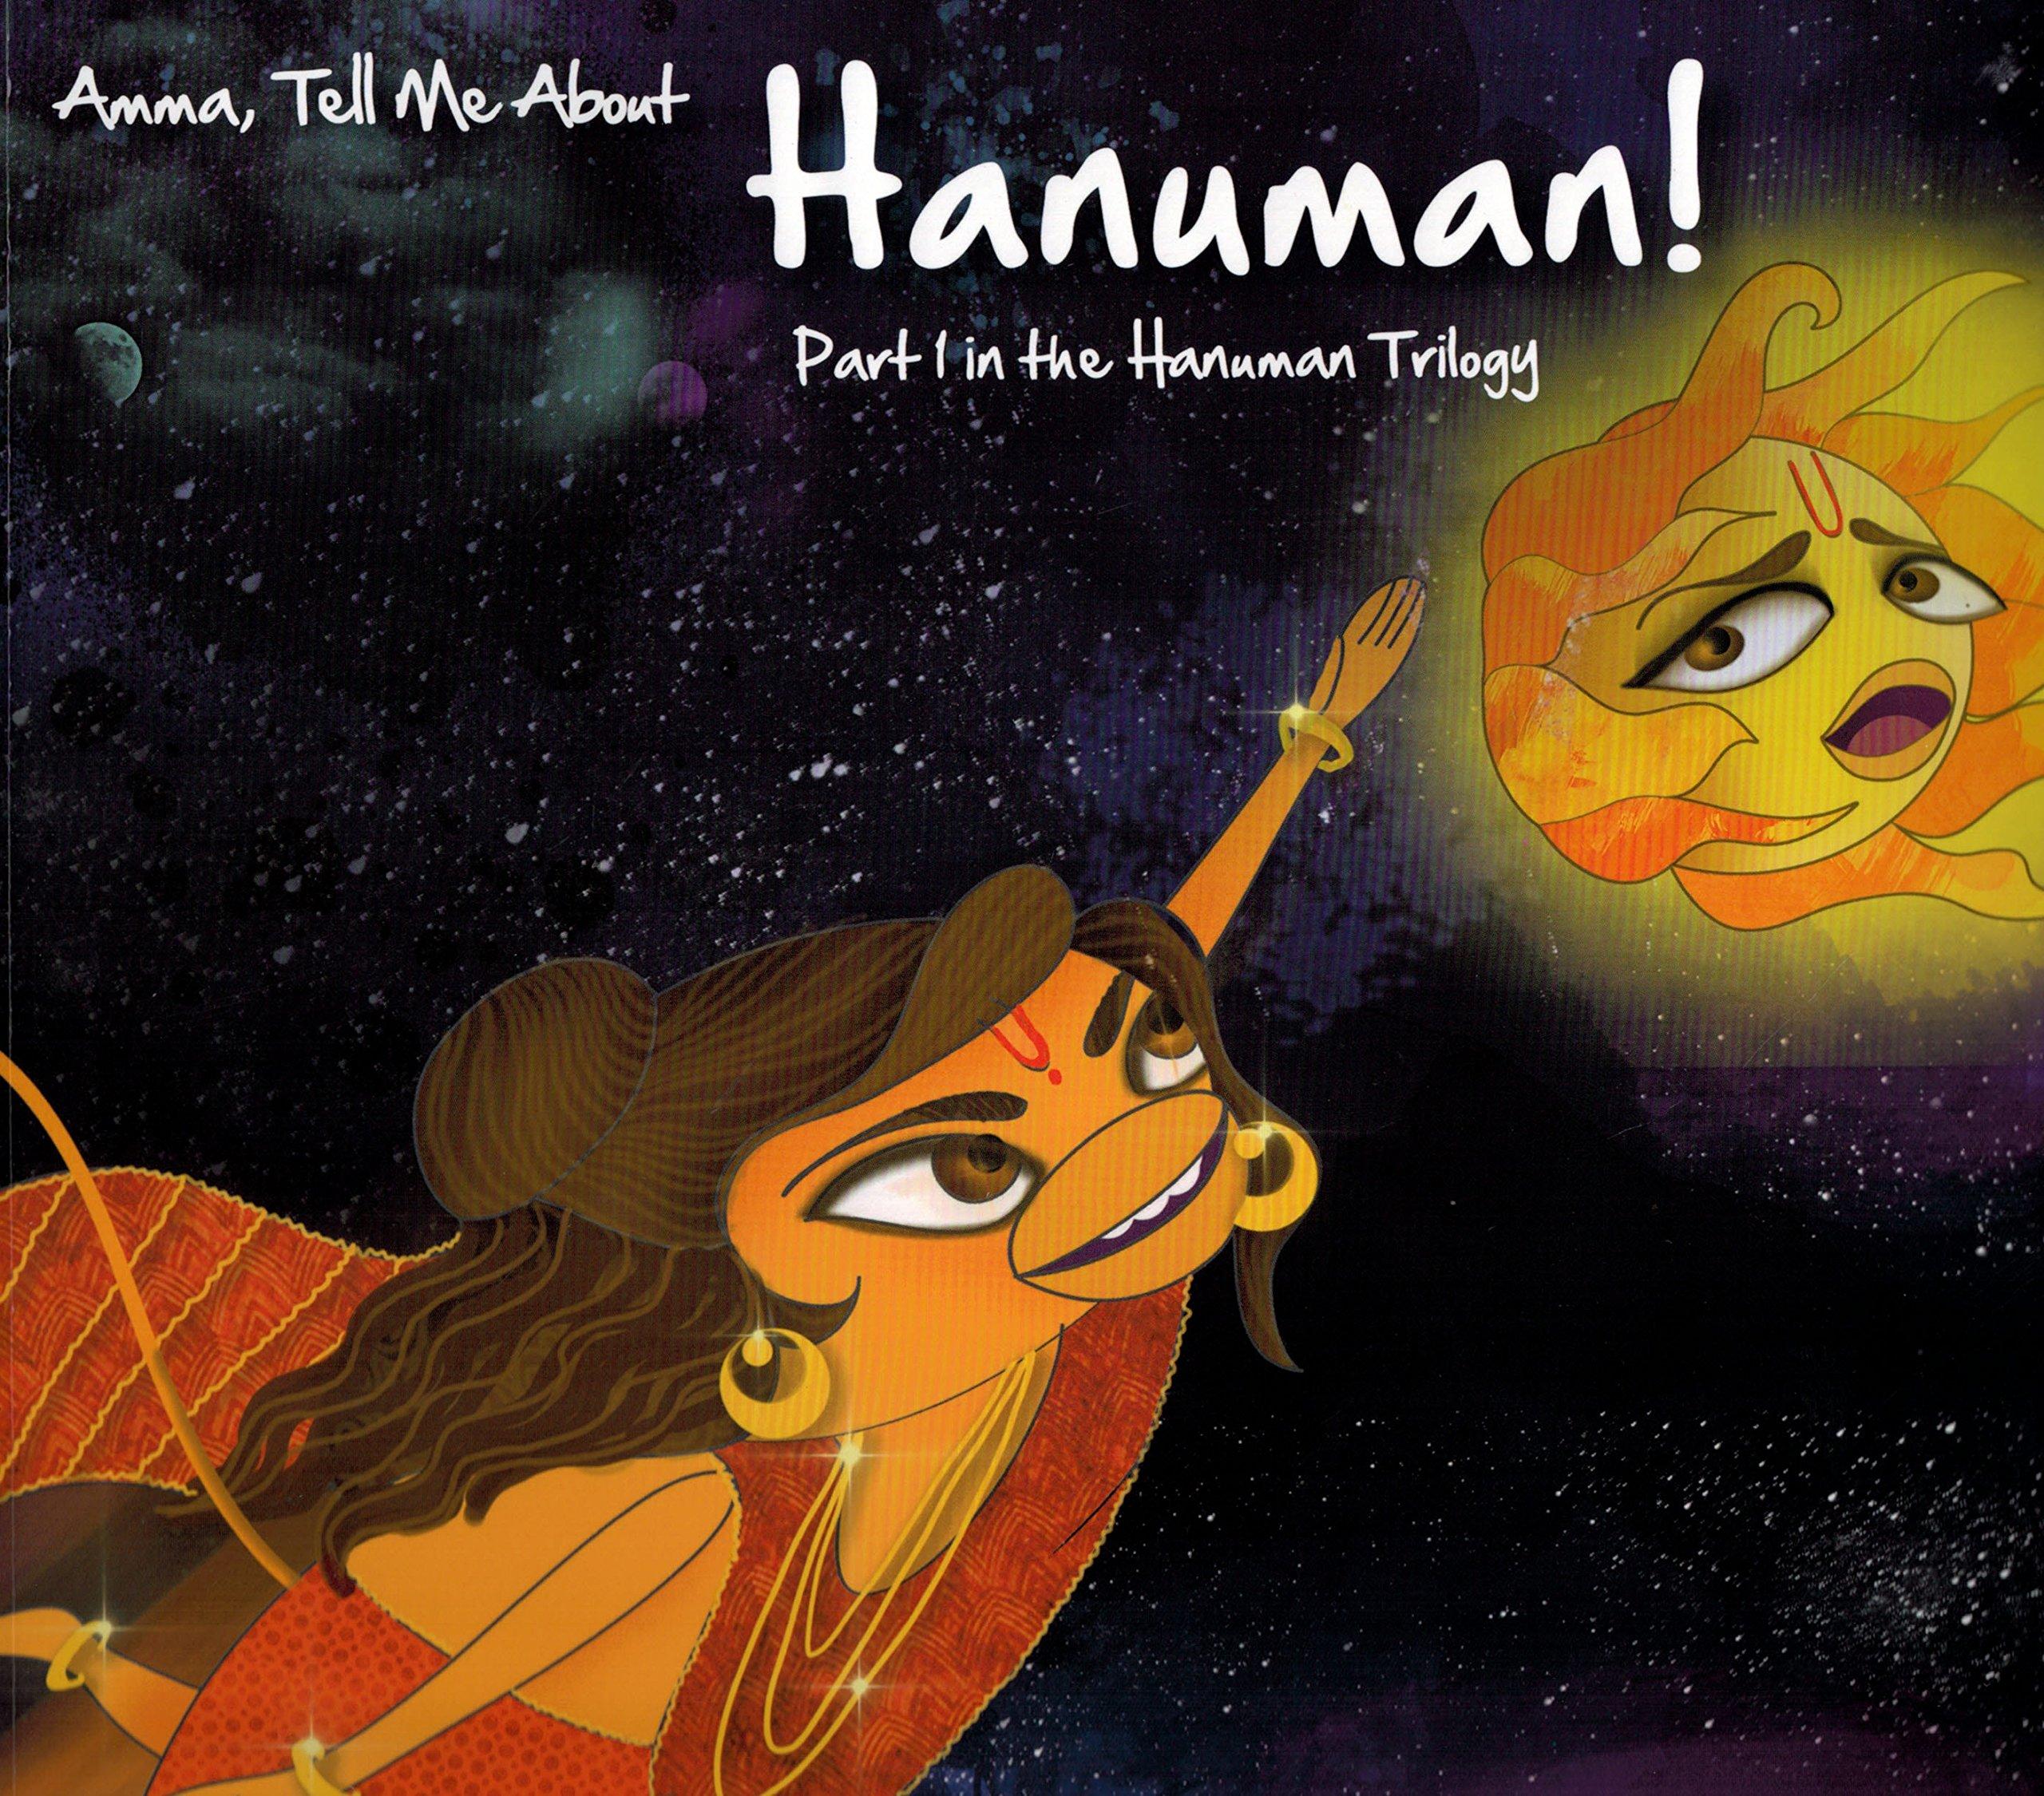 amma tell me about hanuman hanuman trilogy part 1 amazon in amma tell me about hanuman hanuman trilogy part 1 amazon in bhakti mathur books